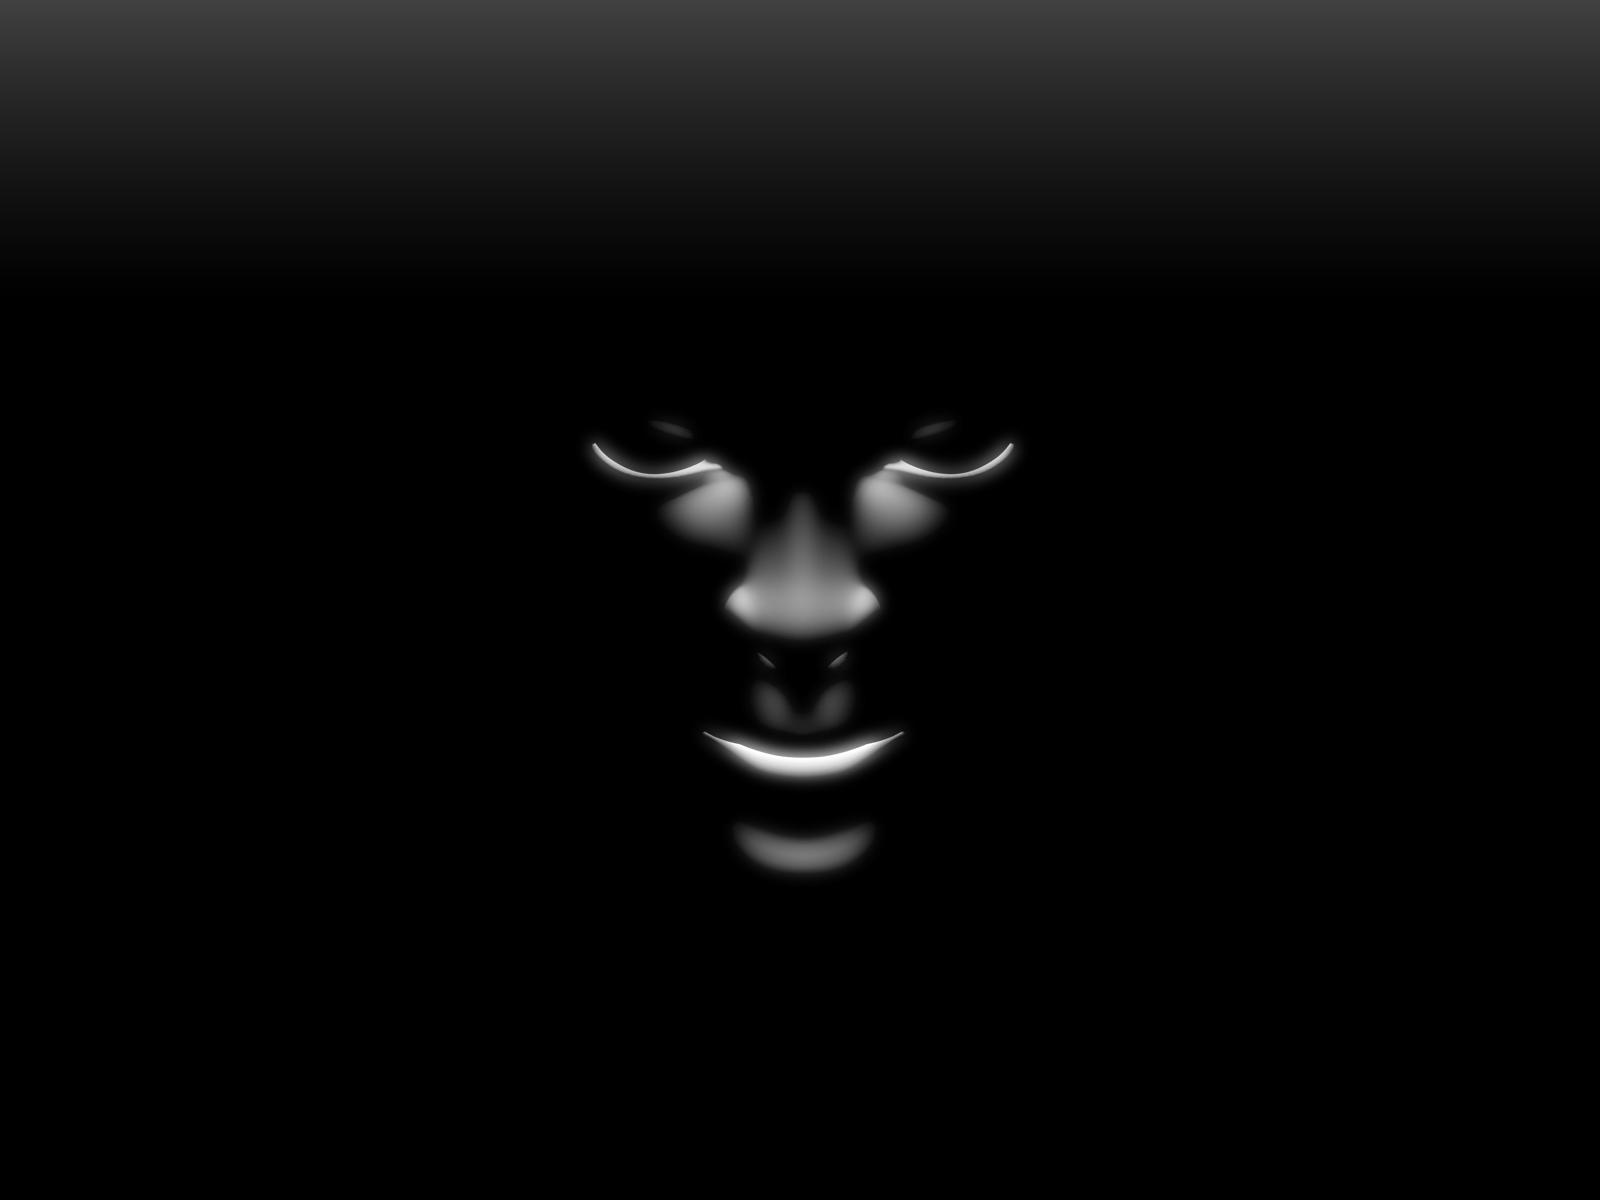 http://3.bp.blogspot.com/-aCTfBUDmEes/UQmfvGDX5ZI/AAAAAAAAAXQ/M_DRLjQngQc/s1600/Black+Art+Wallpaper+HD+(4).jpg